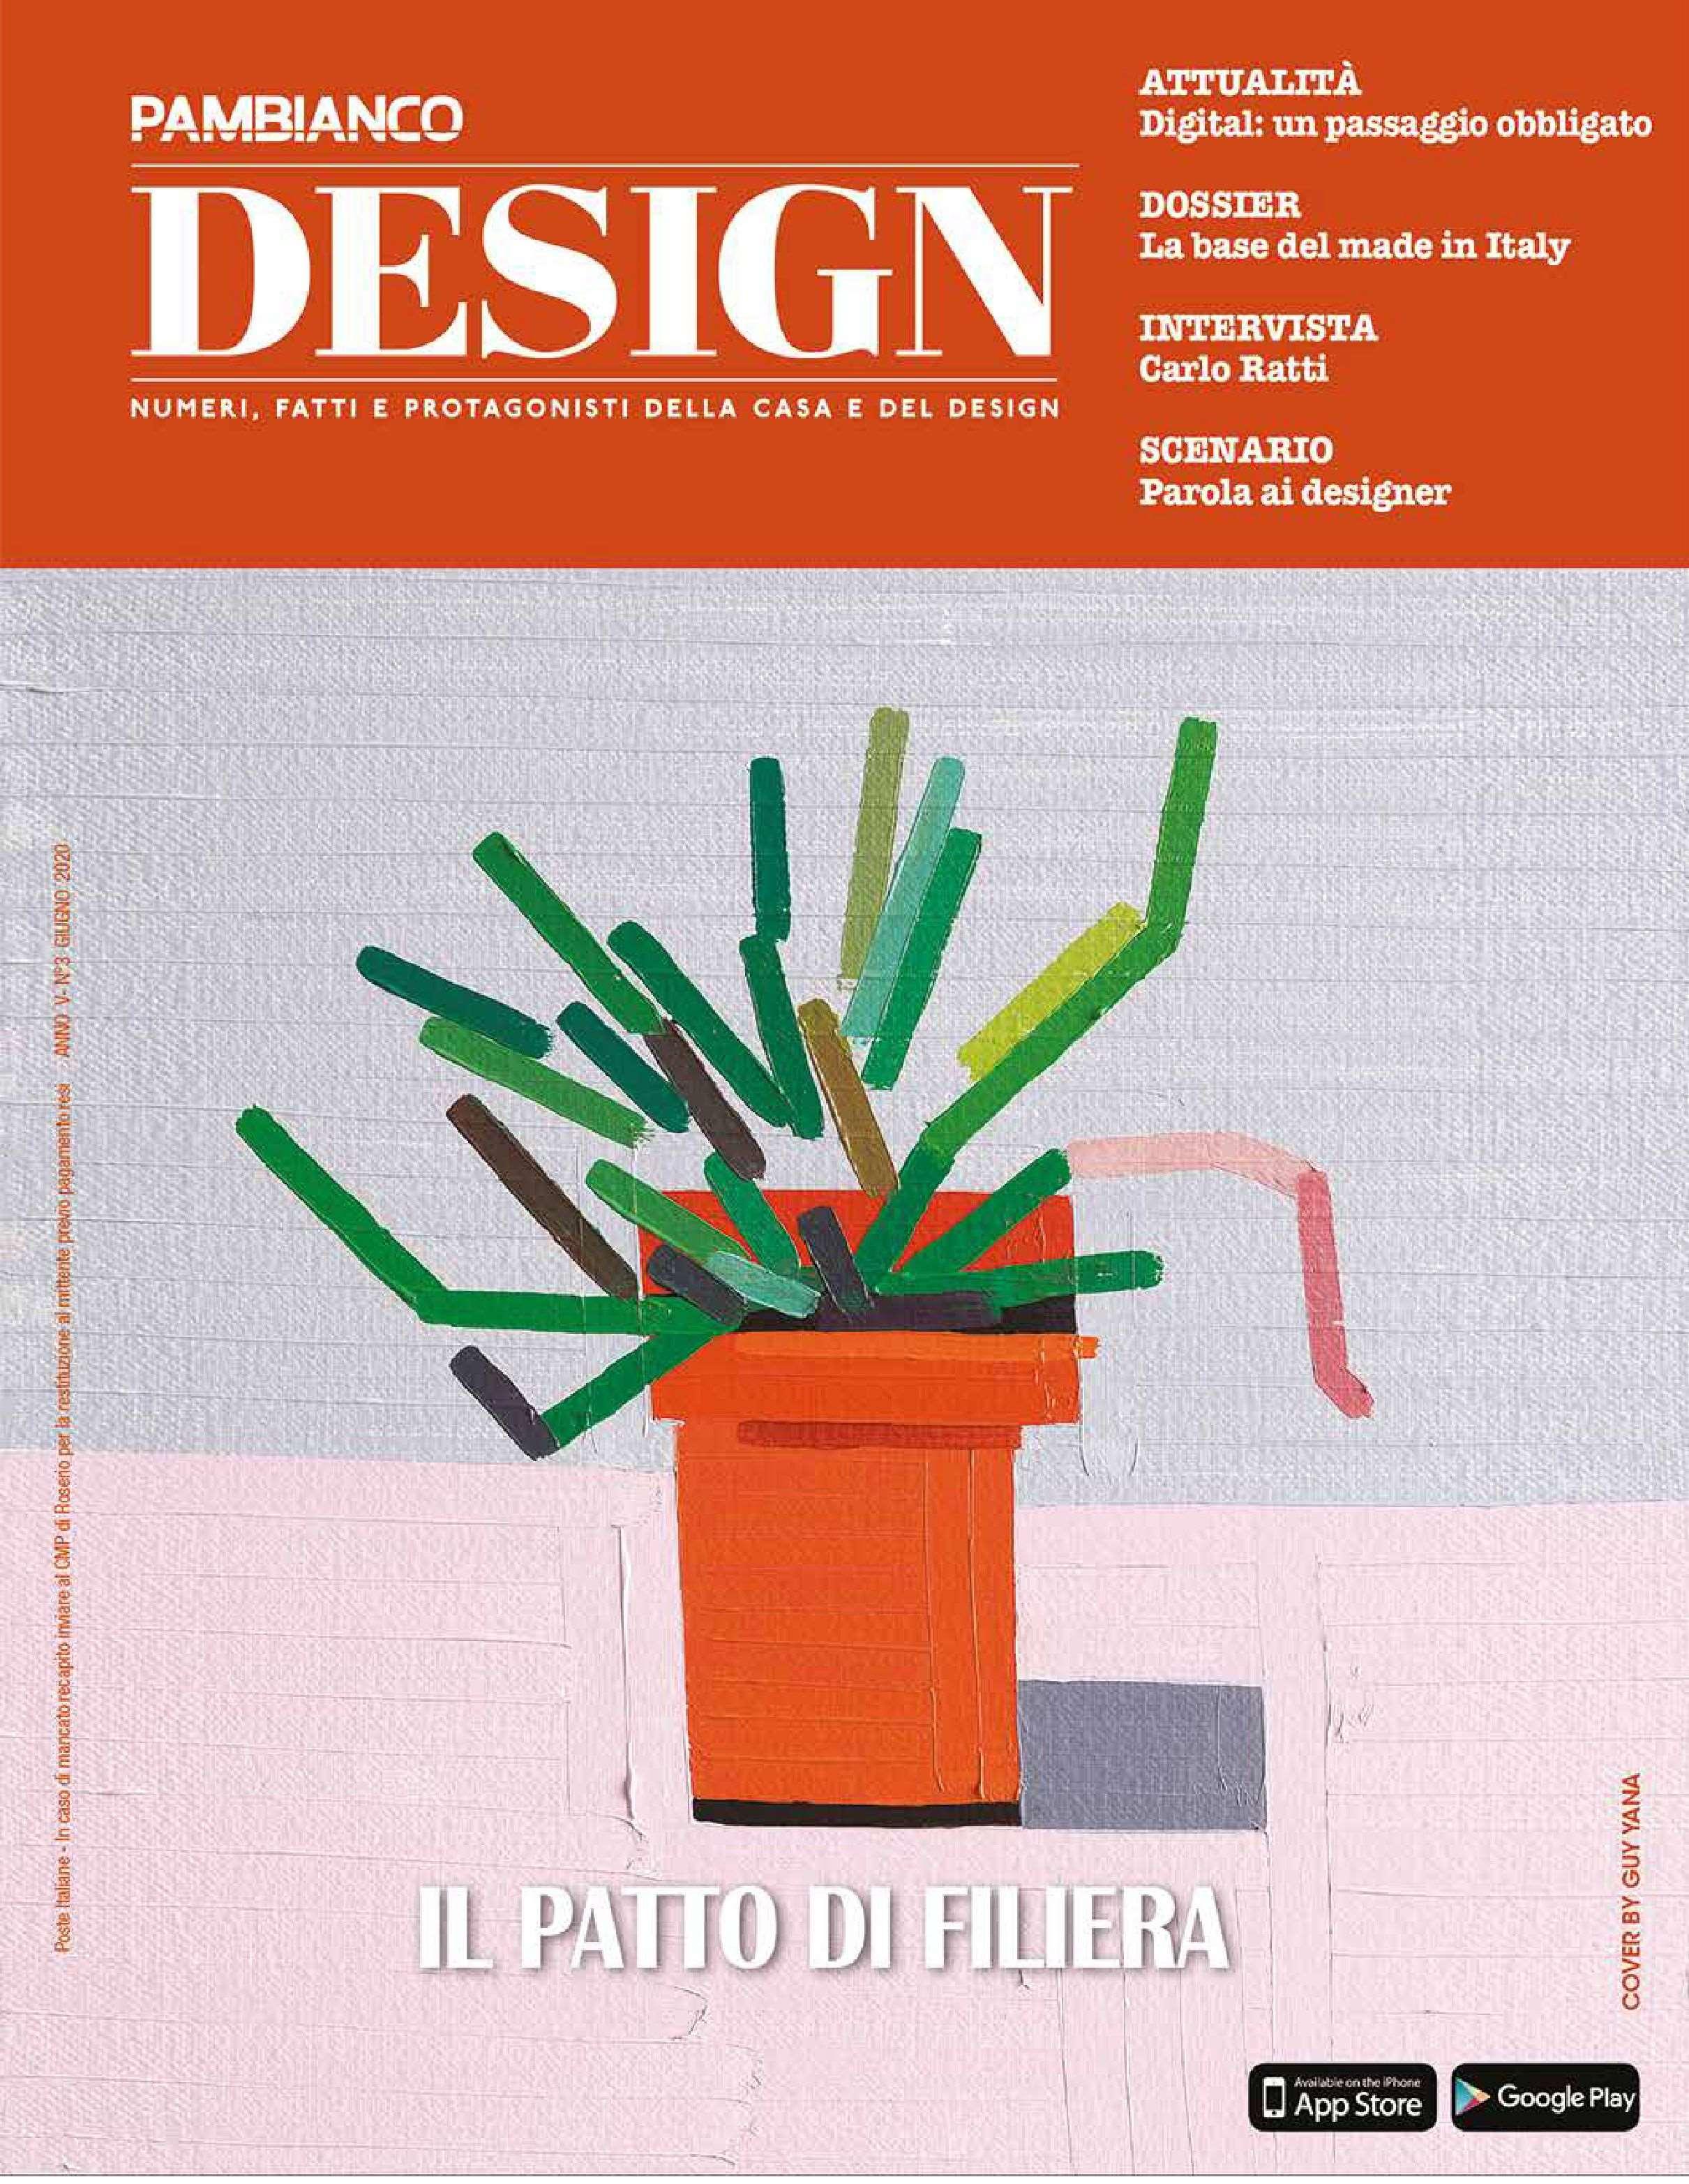 2020.06.01 – Pambianco Magazine IT – Design – cover